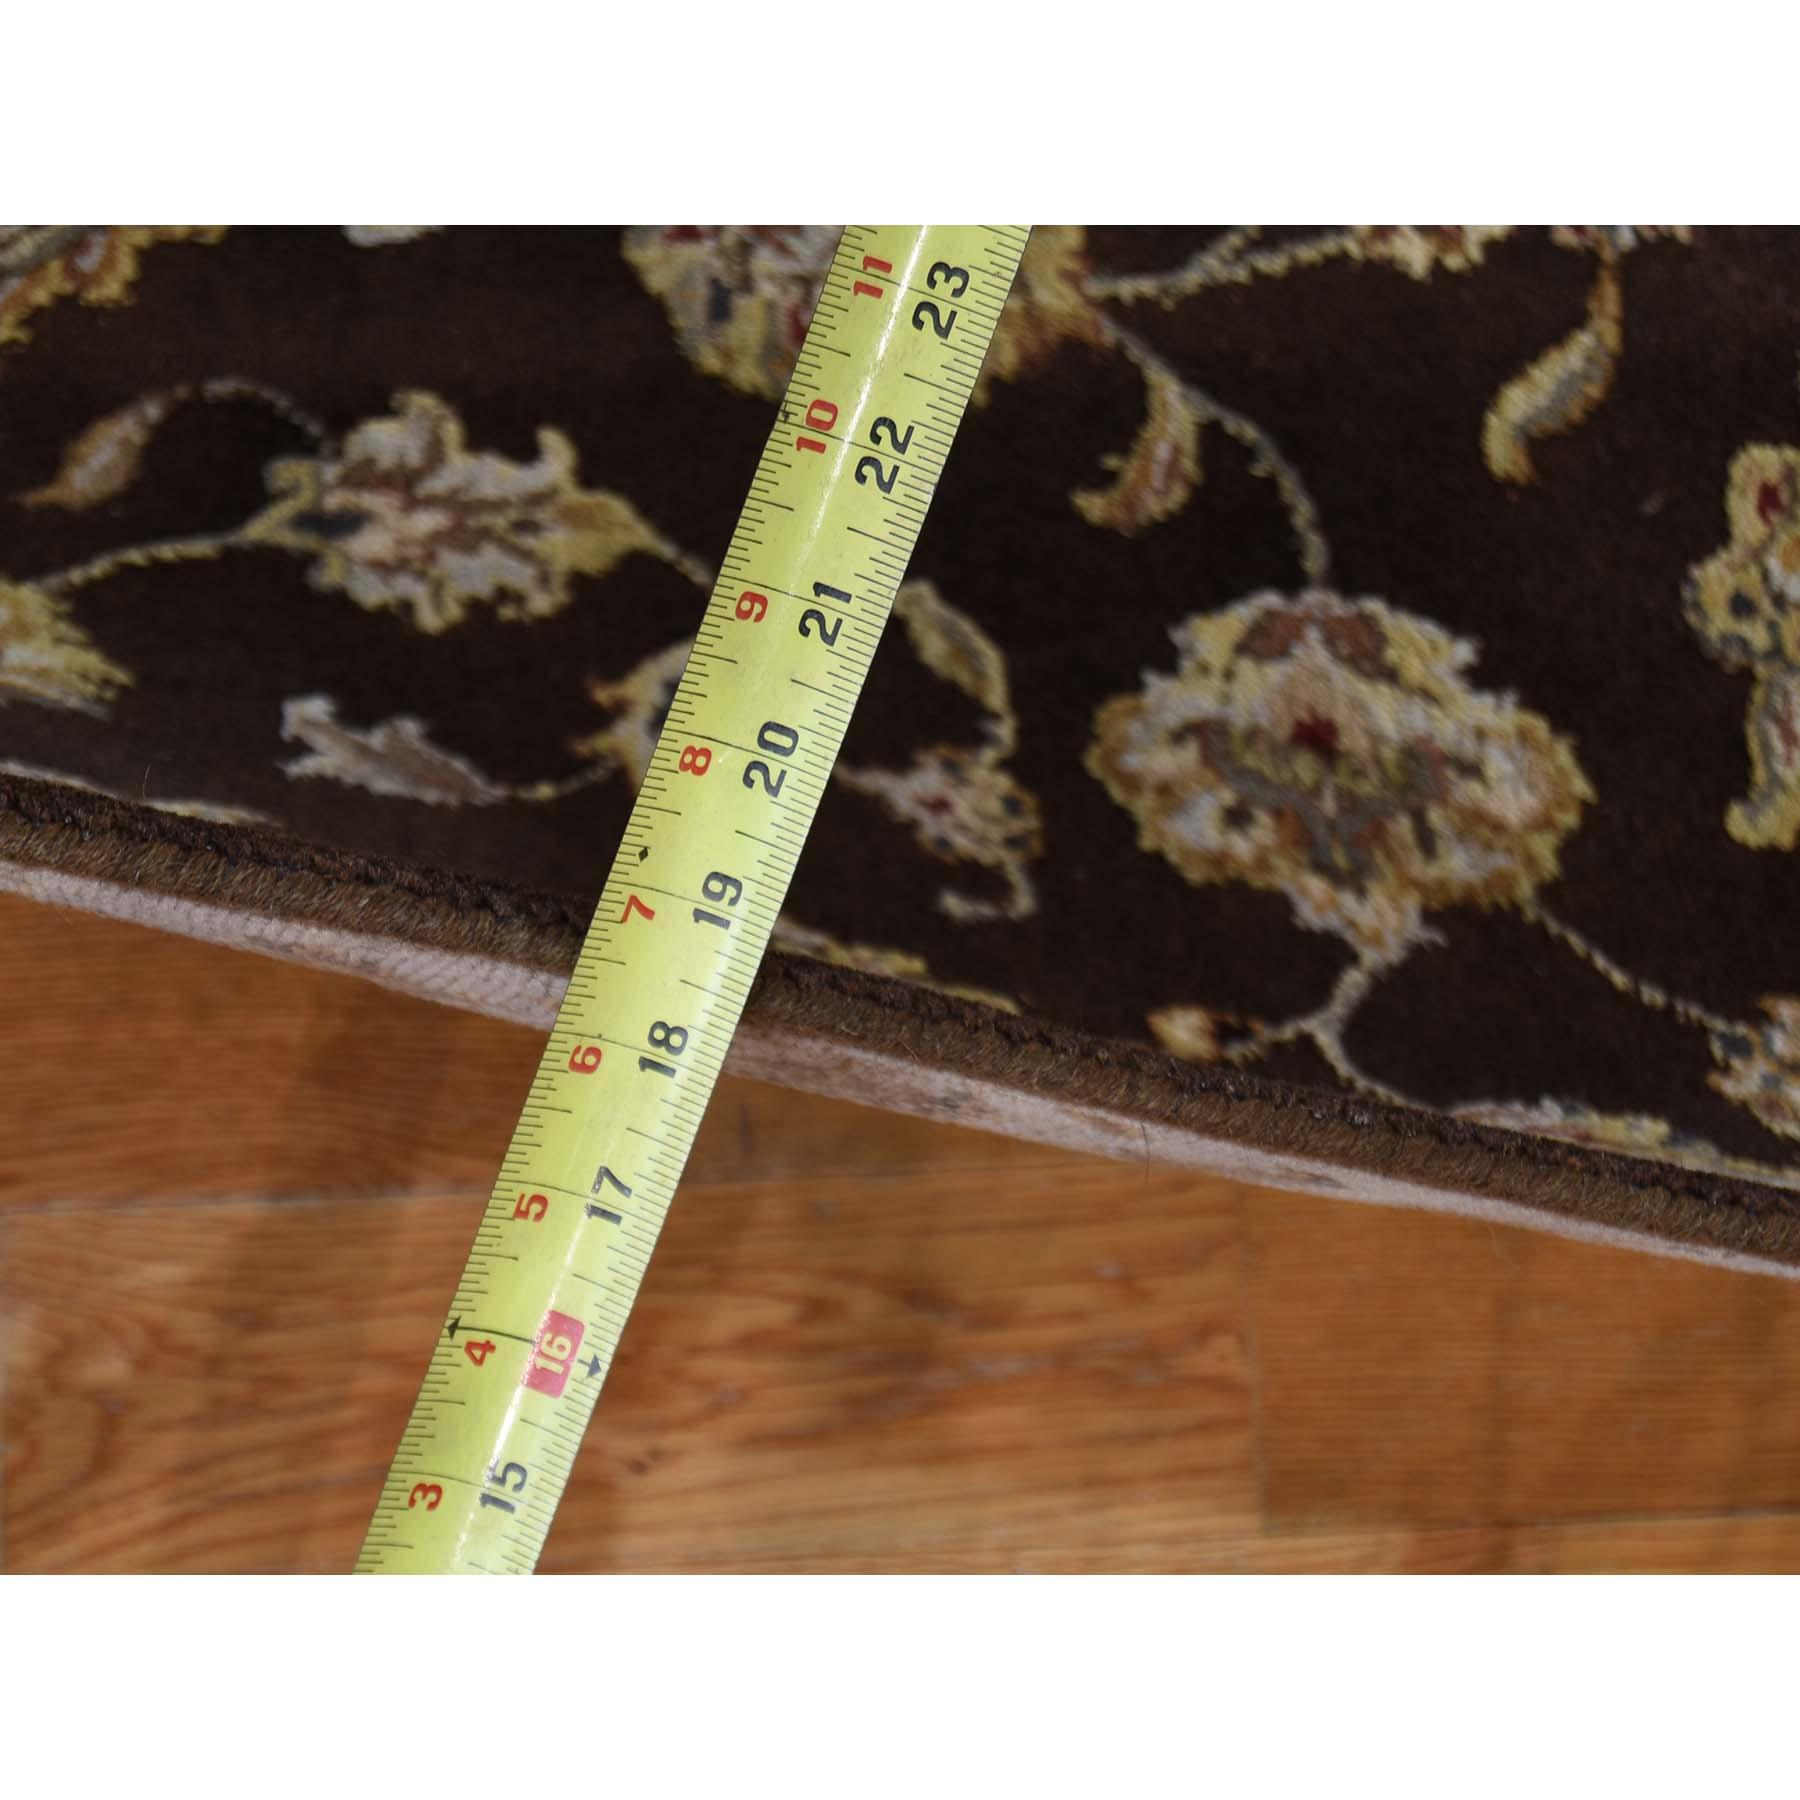 2-6--x12-1-- Hand-Knotted Half Wool Half Silk Rajasthan Runner Rug